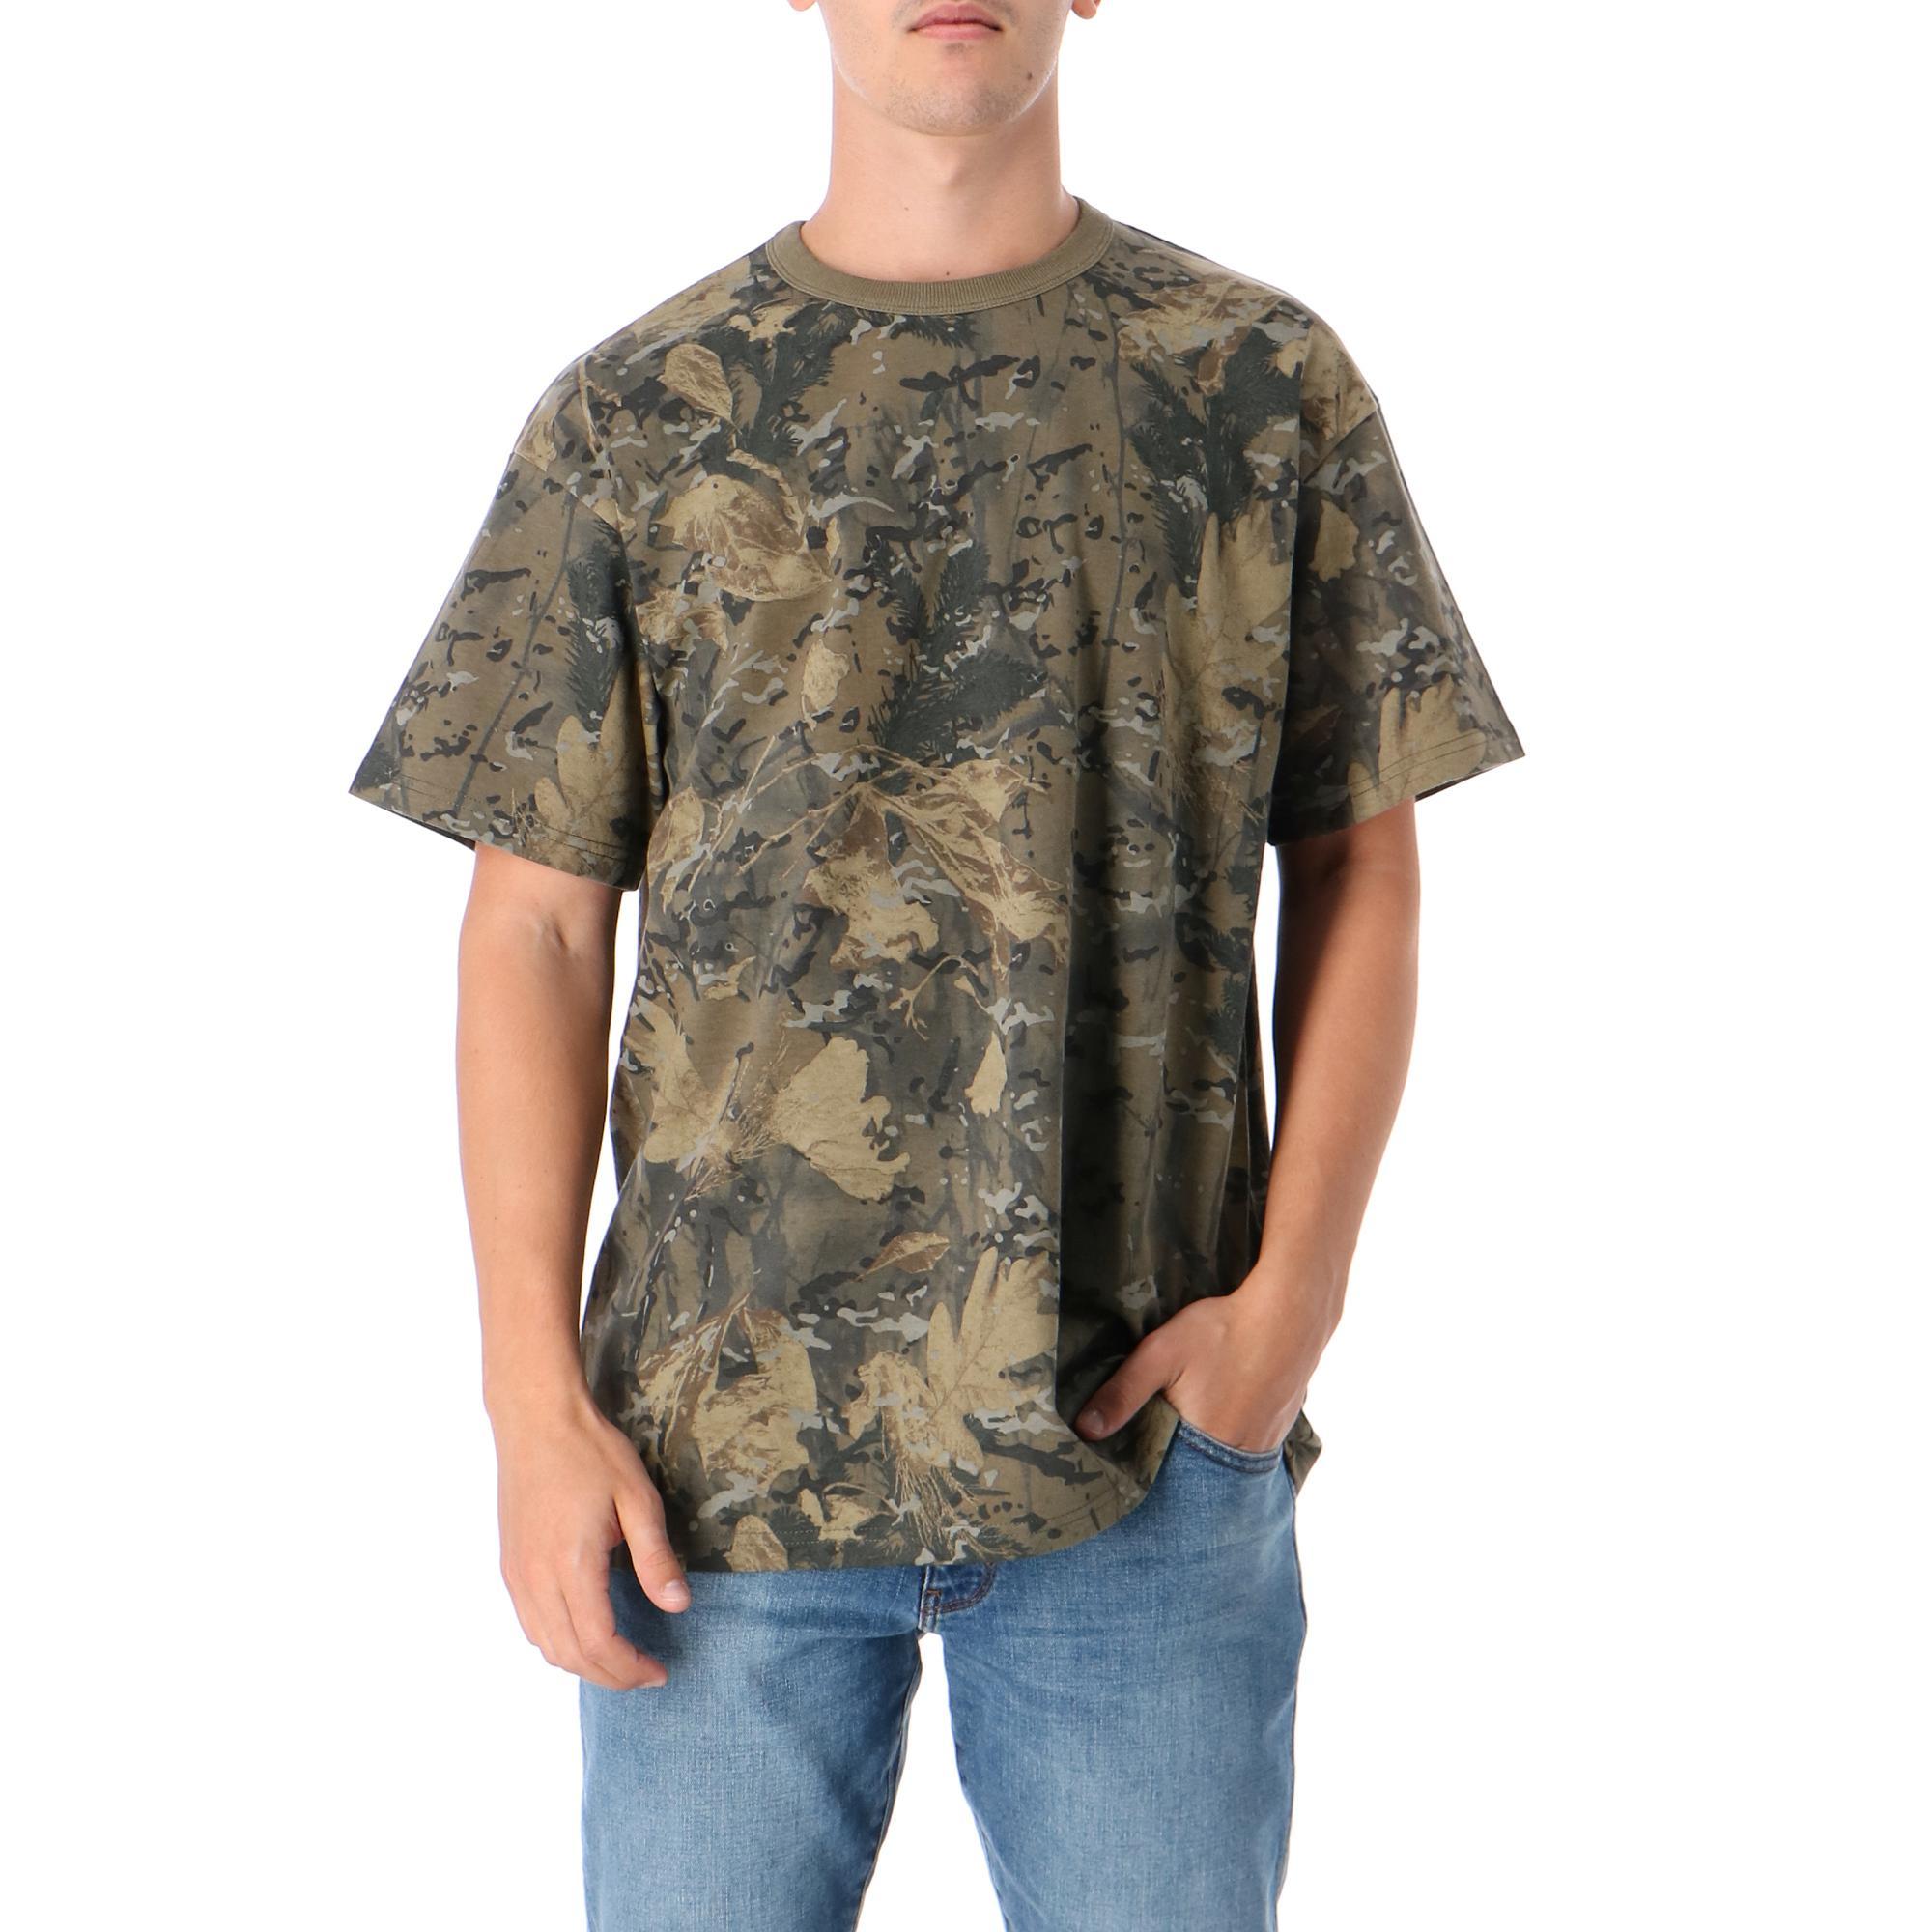 Carhartt S/s Military T-shirt Camo combi